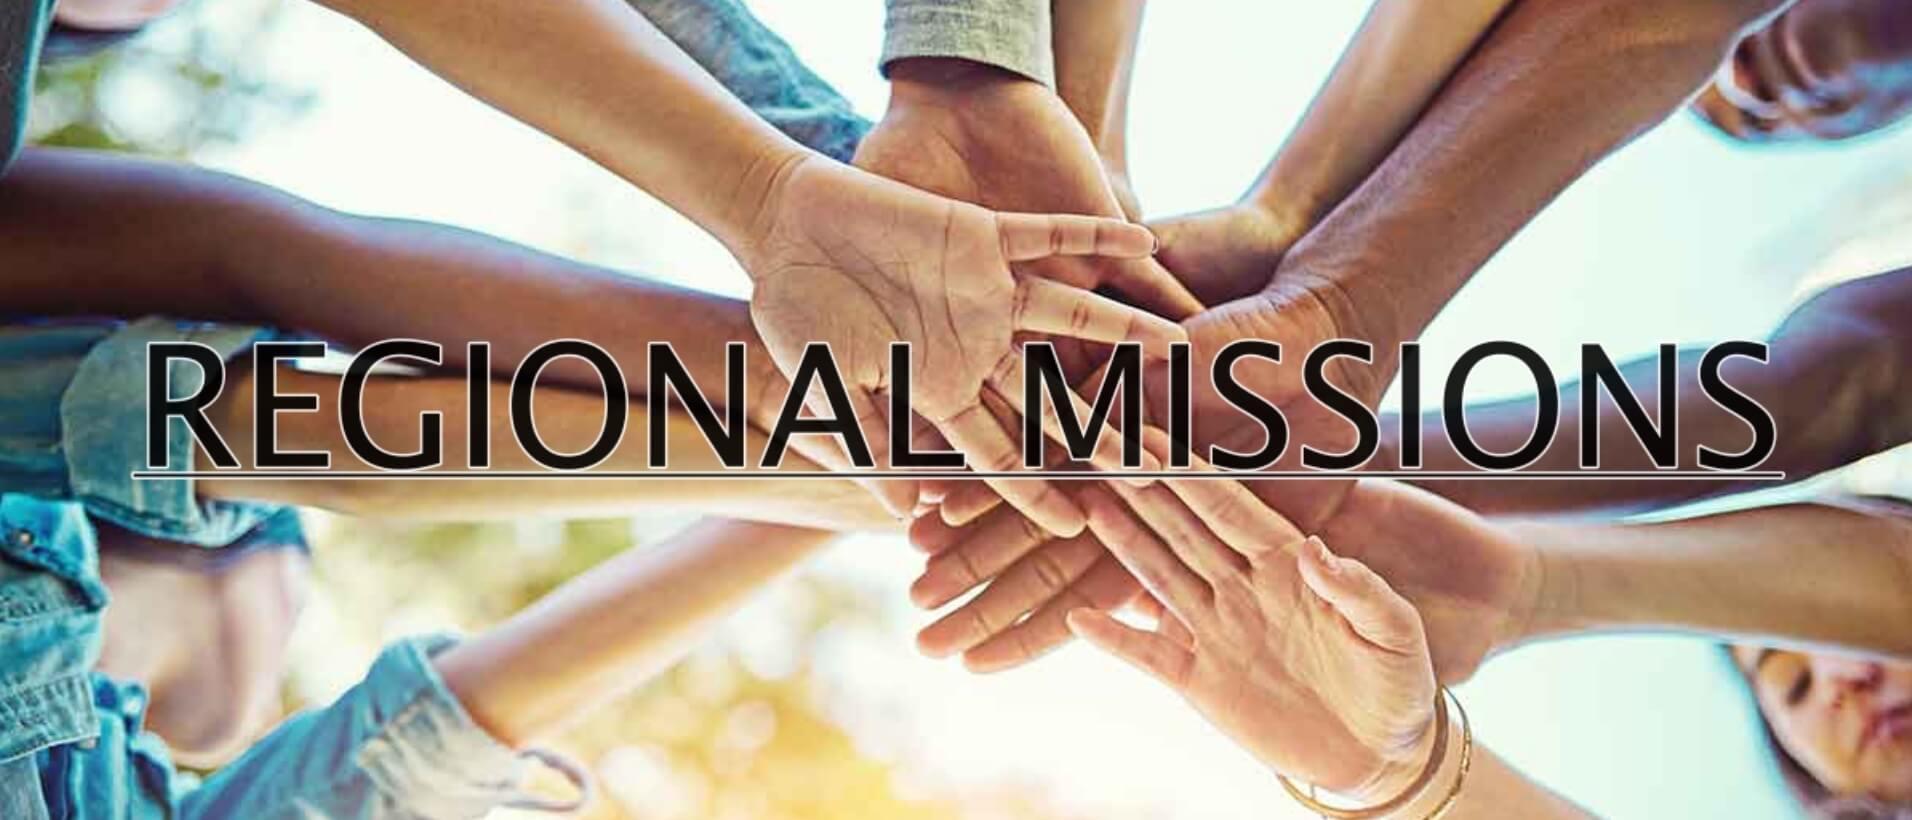 Regional Missions